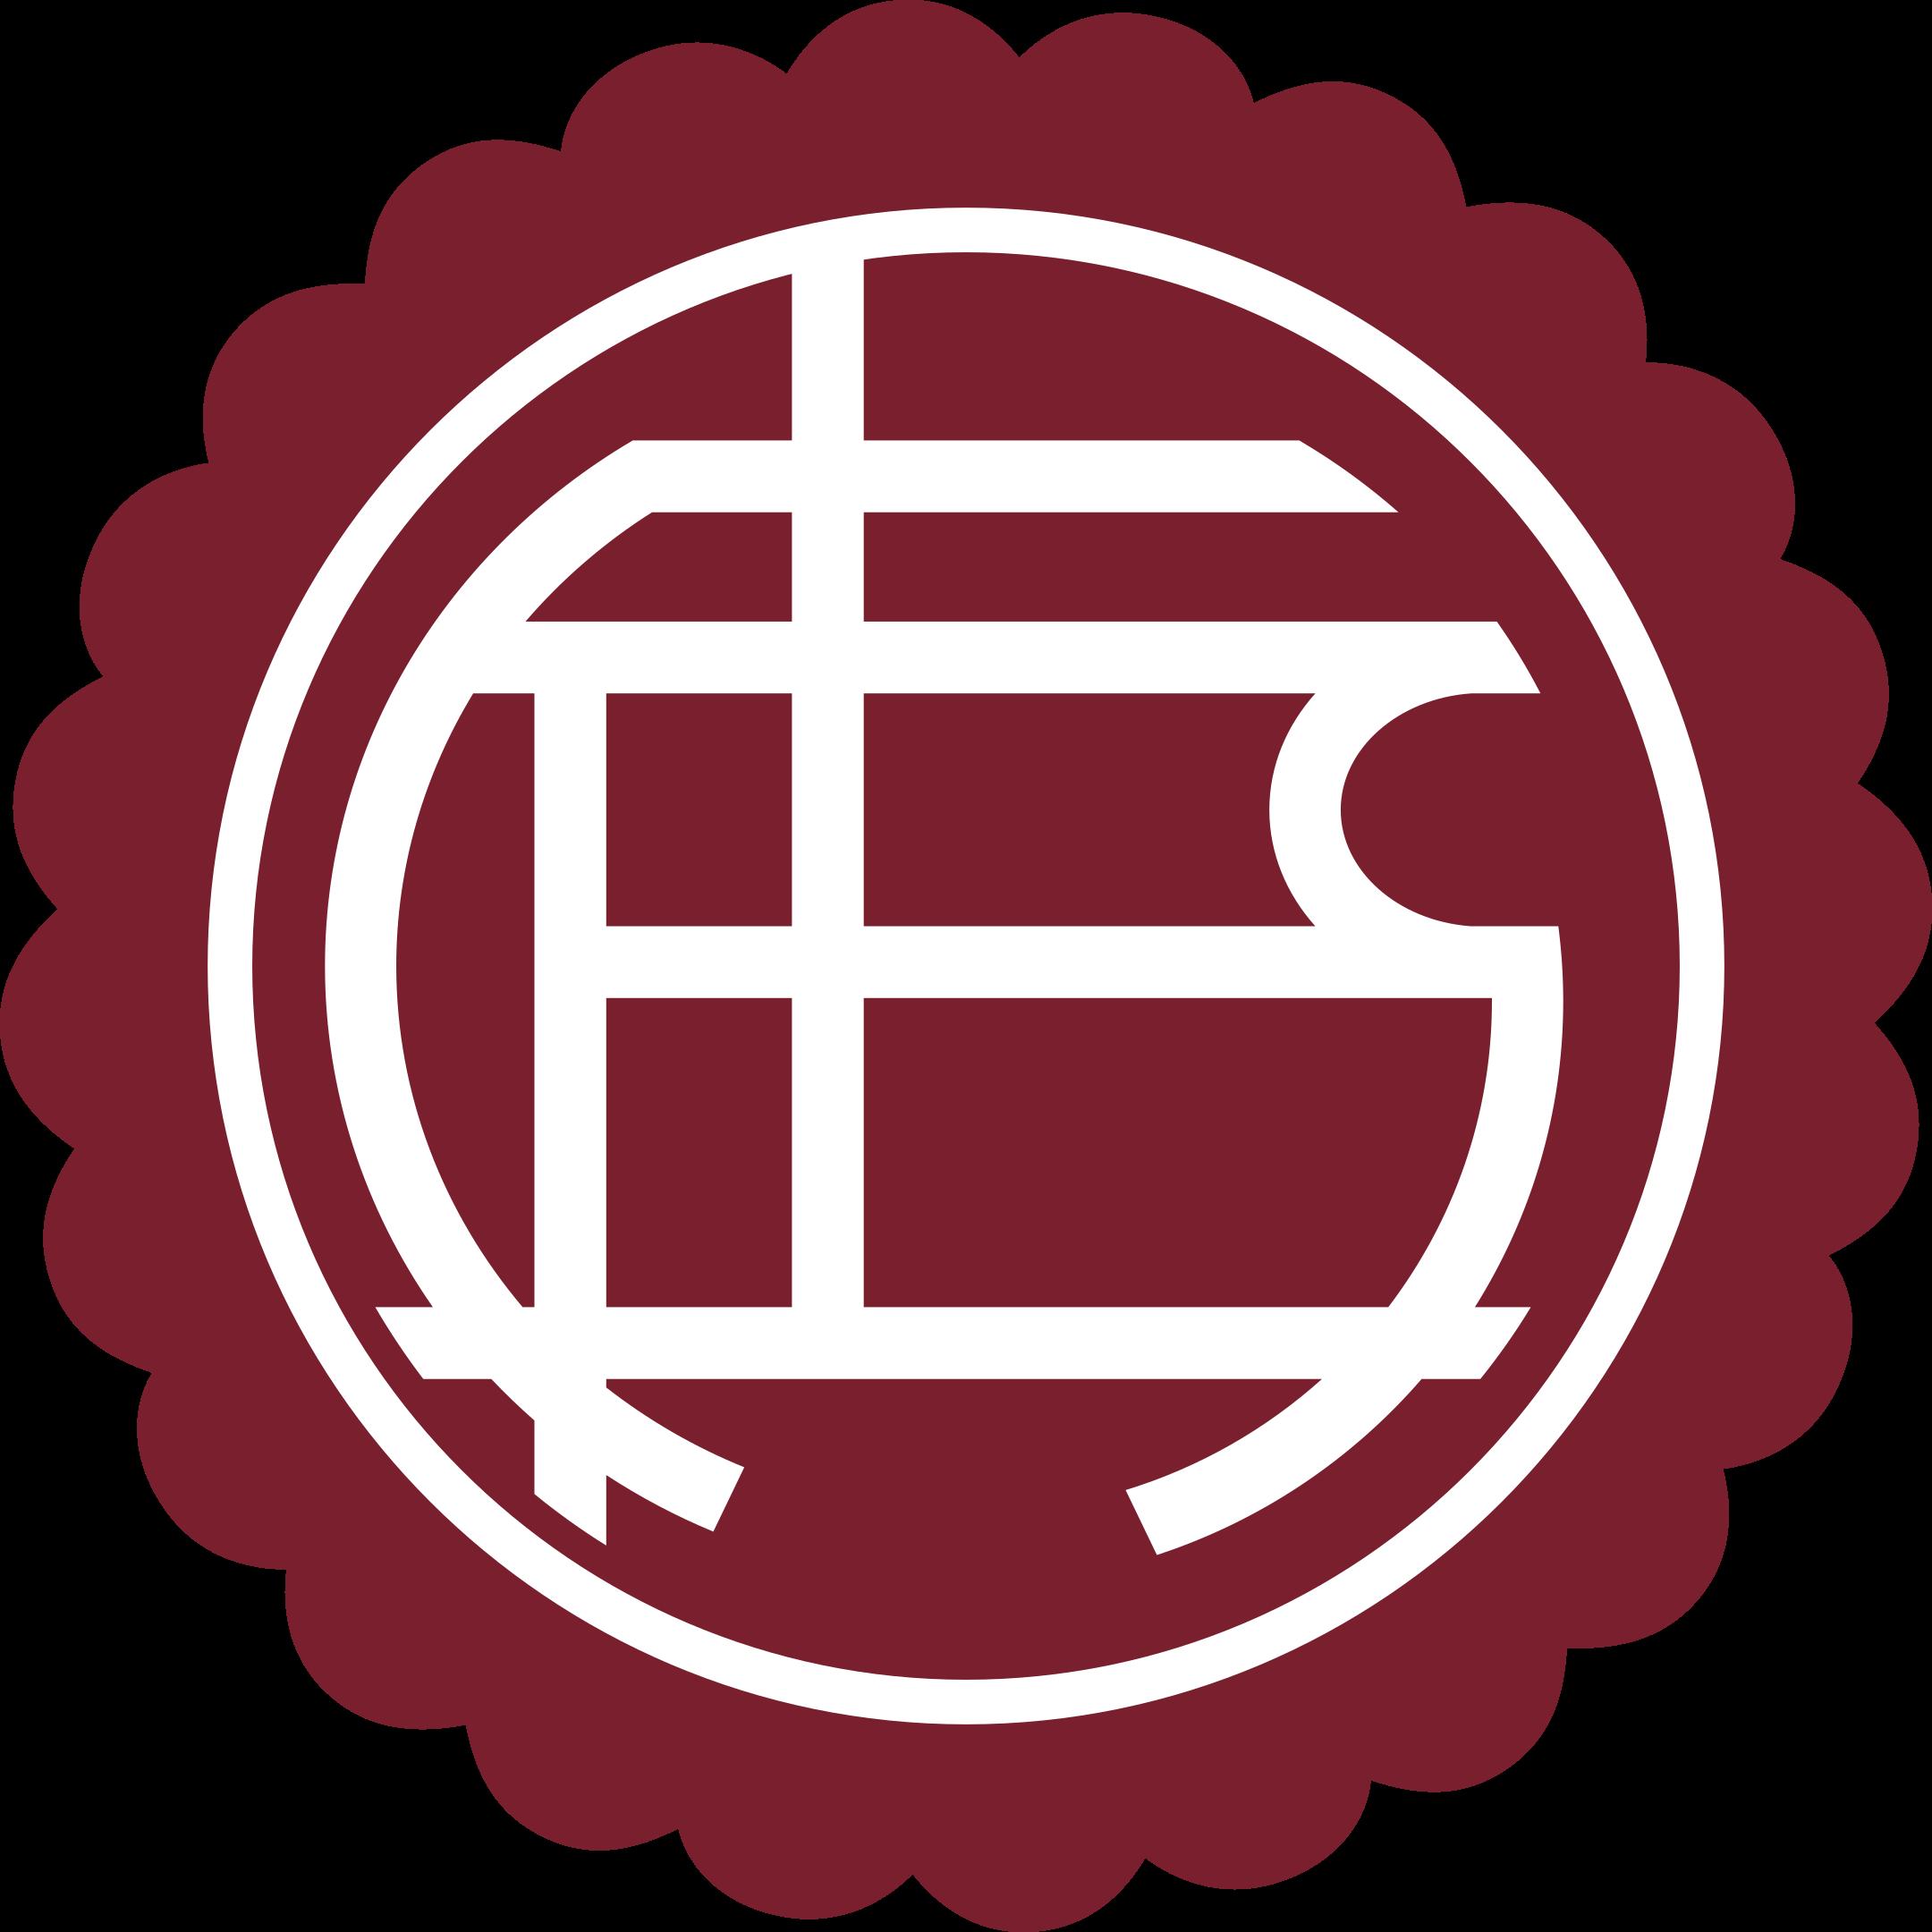 lanus logo 1 - Club Atlético Lanús Logo - Escudo